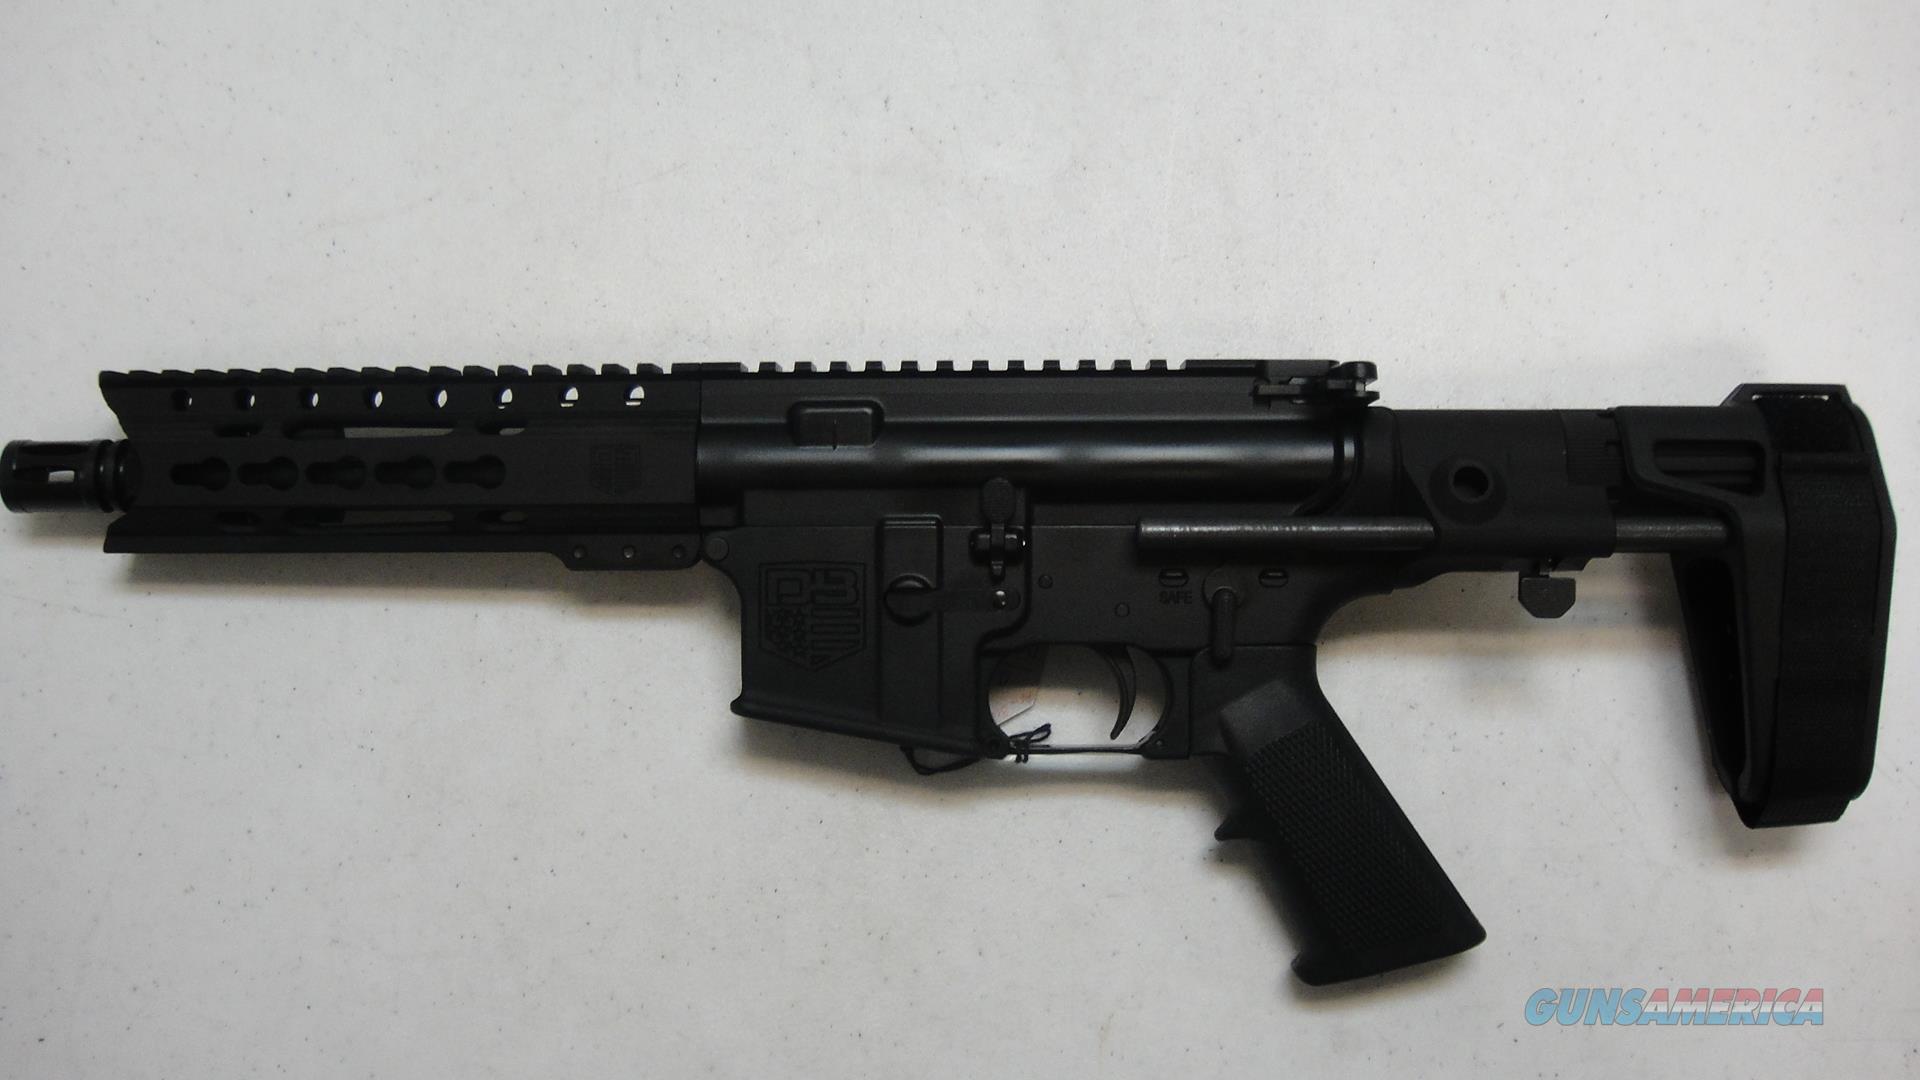 Diamondback DB15 pistol w/ Arm Brace  Guns > Pistols > Diamondback Pistols